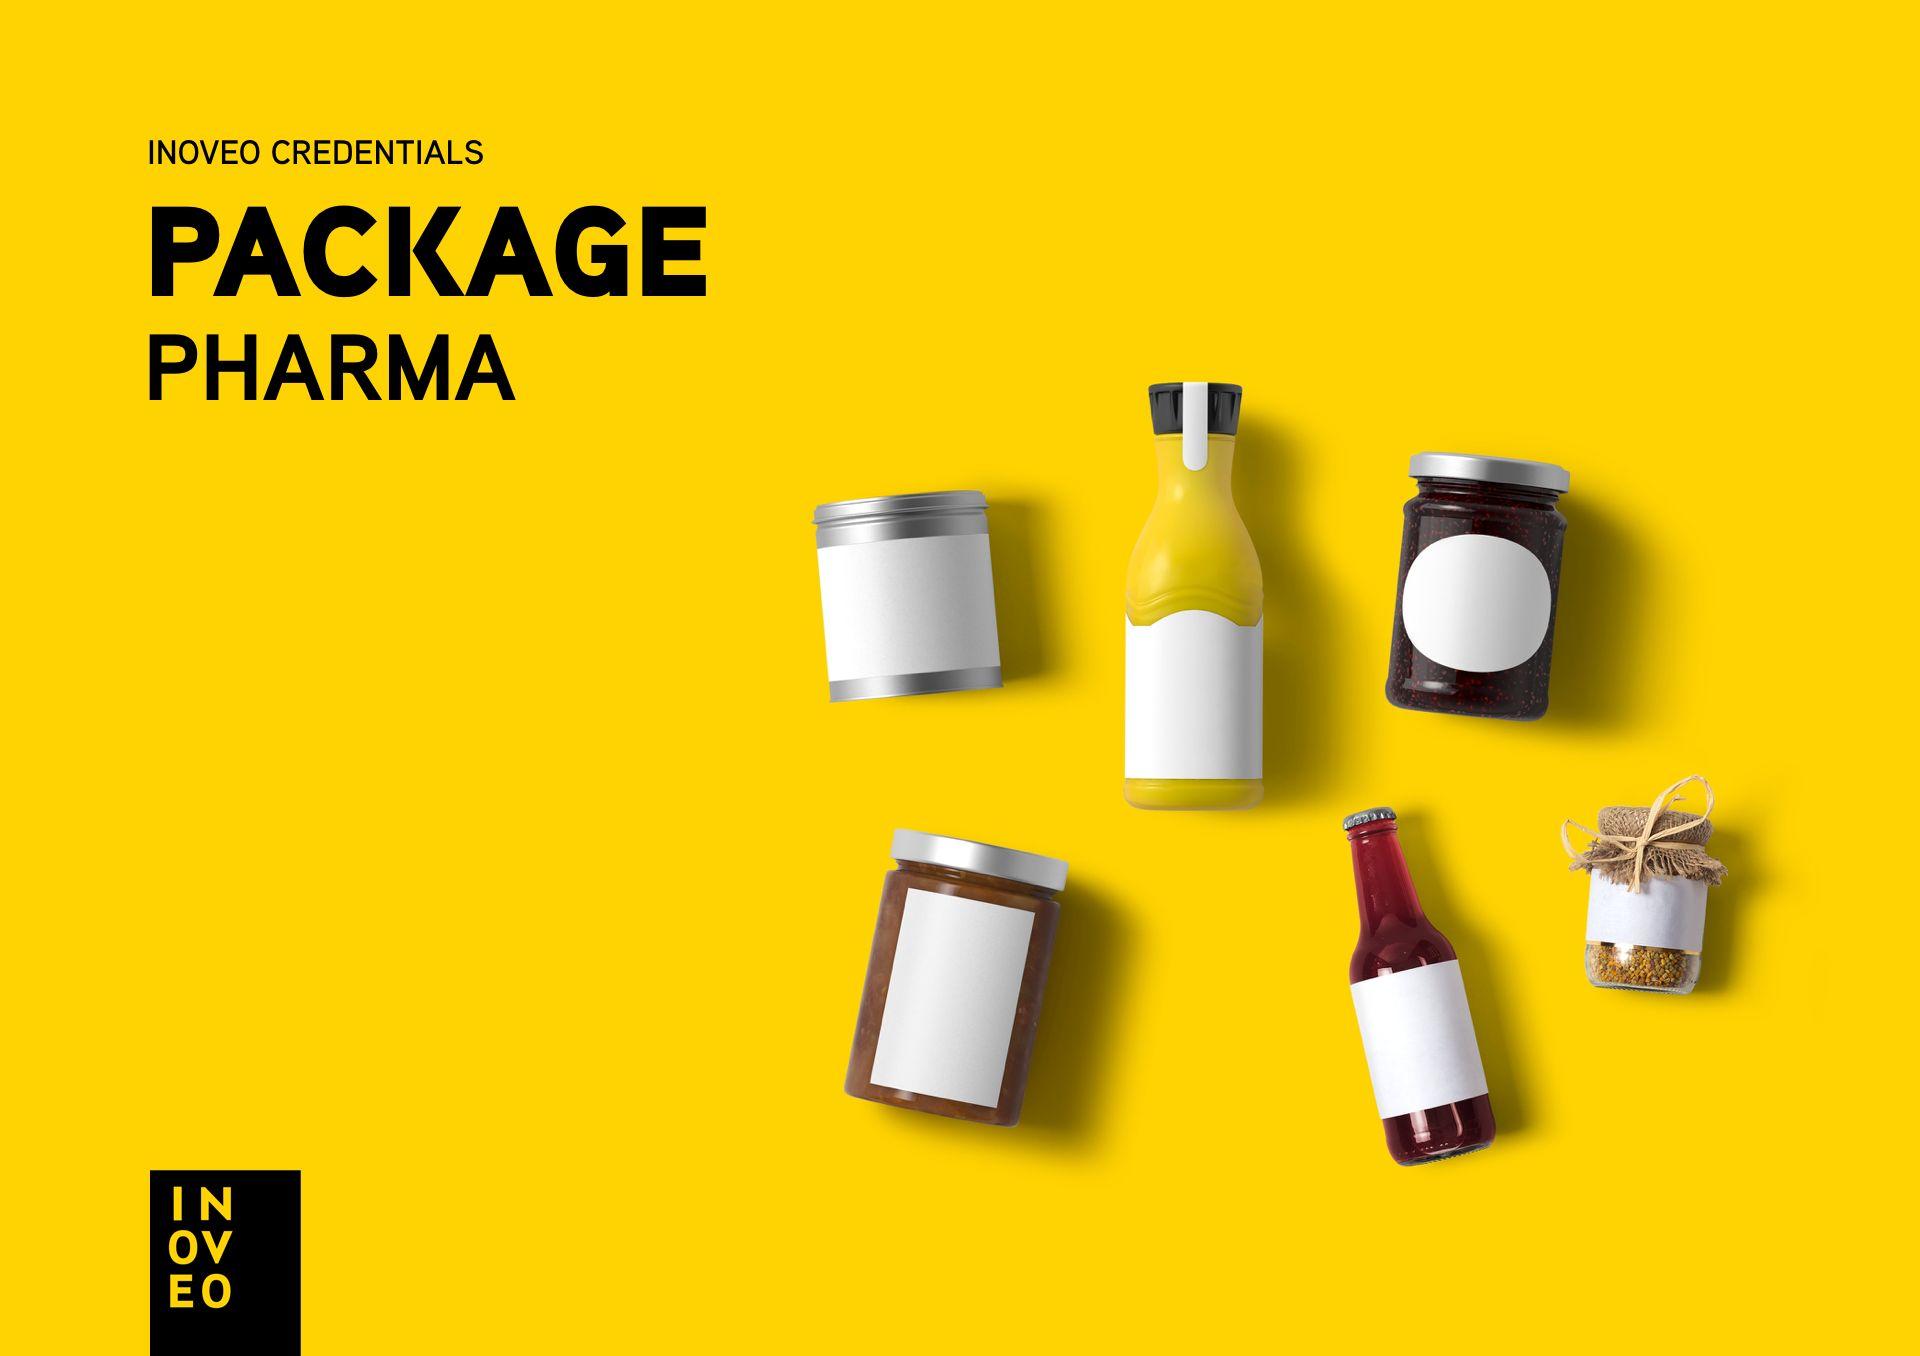 package credentials INOVEO branding